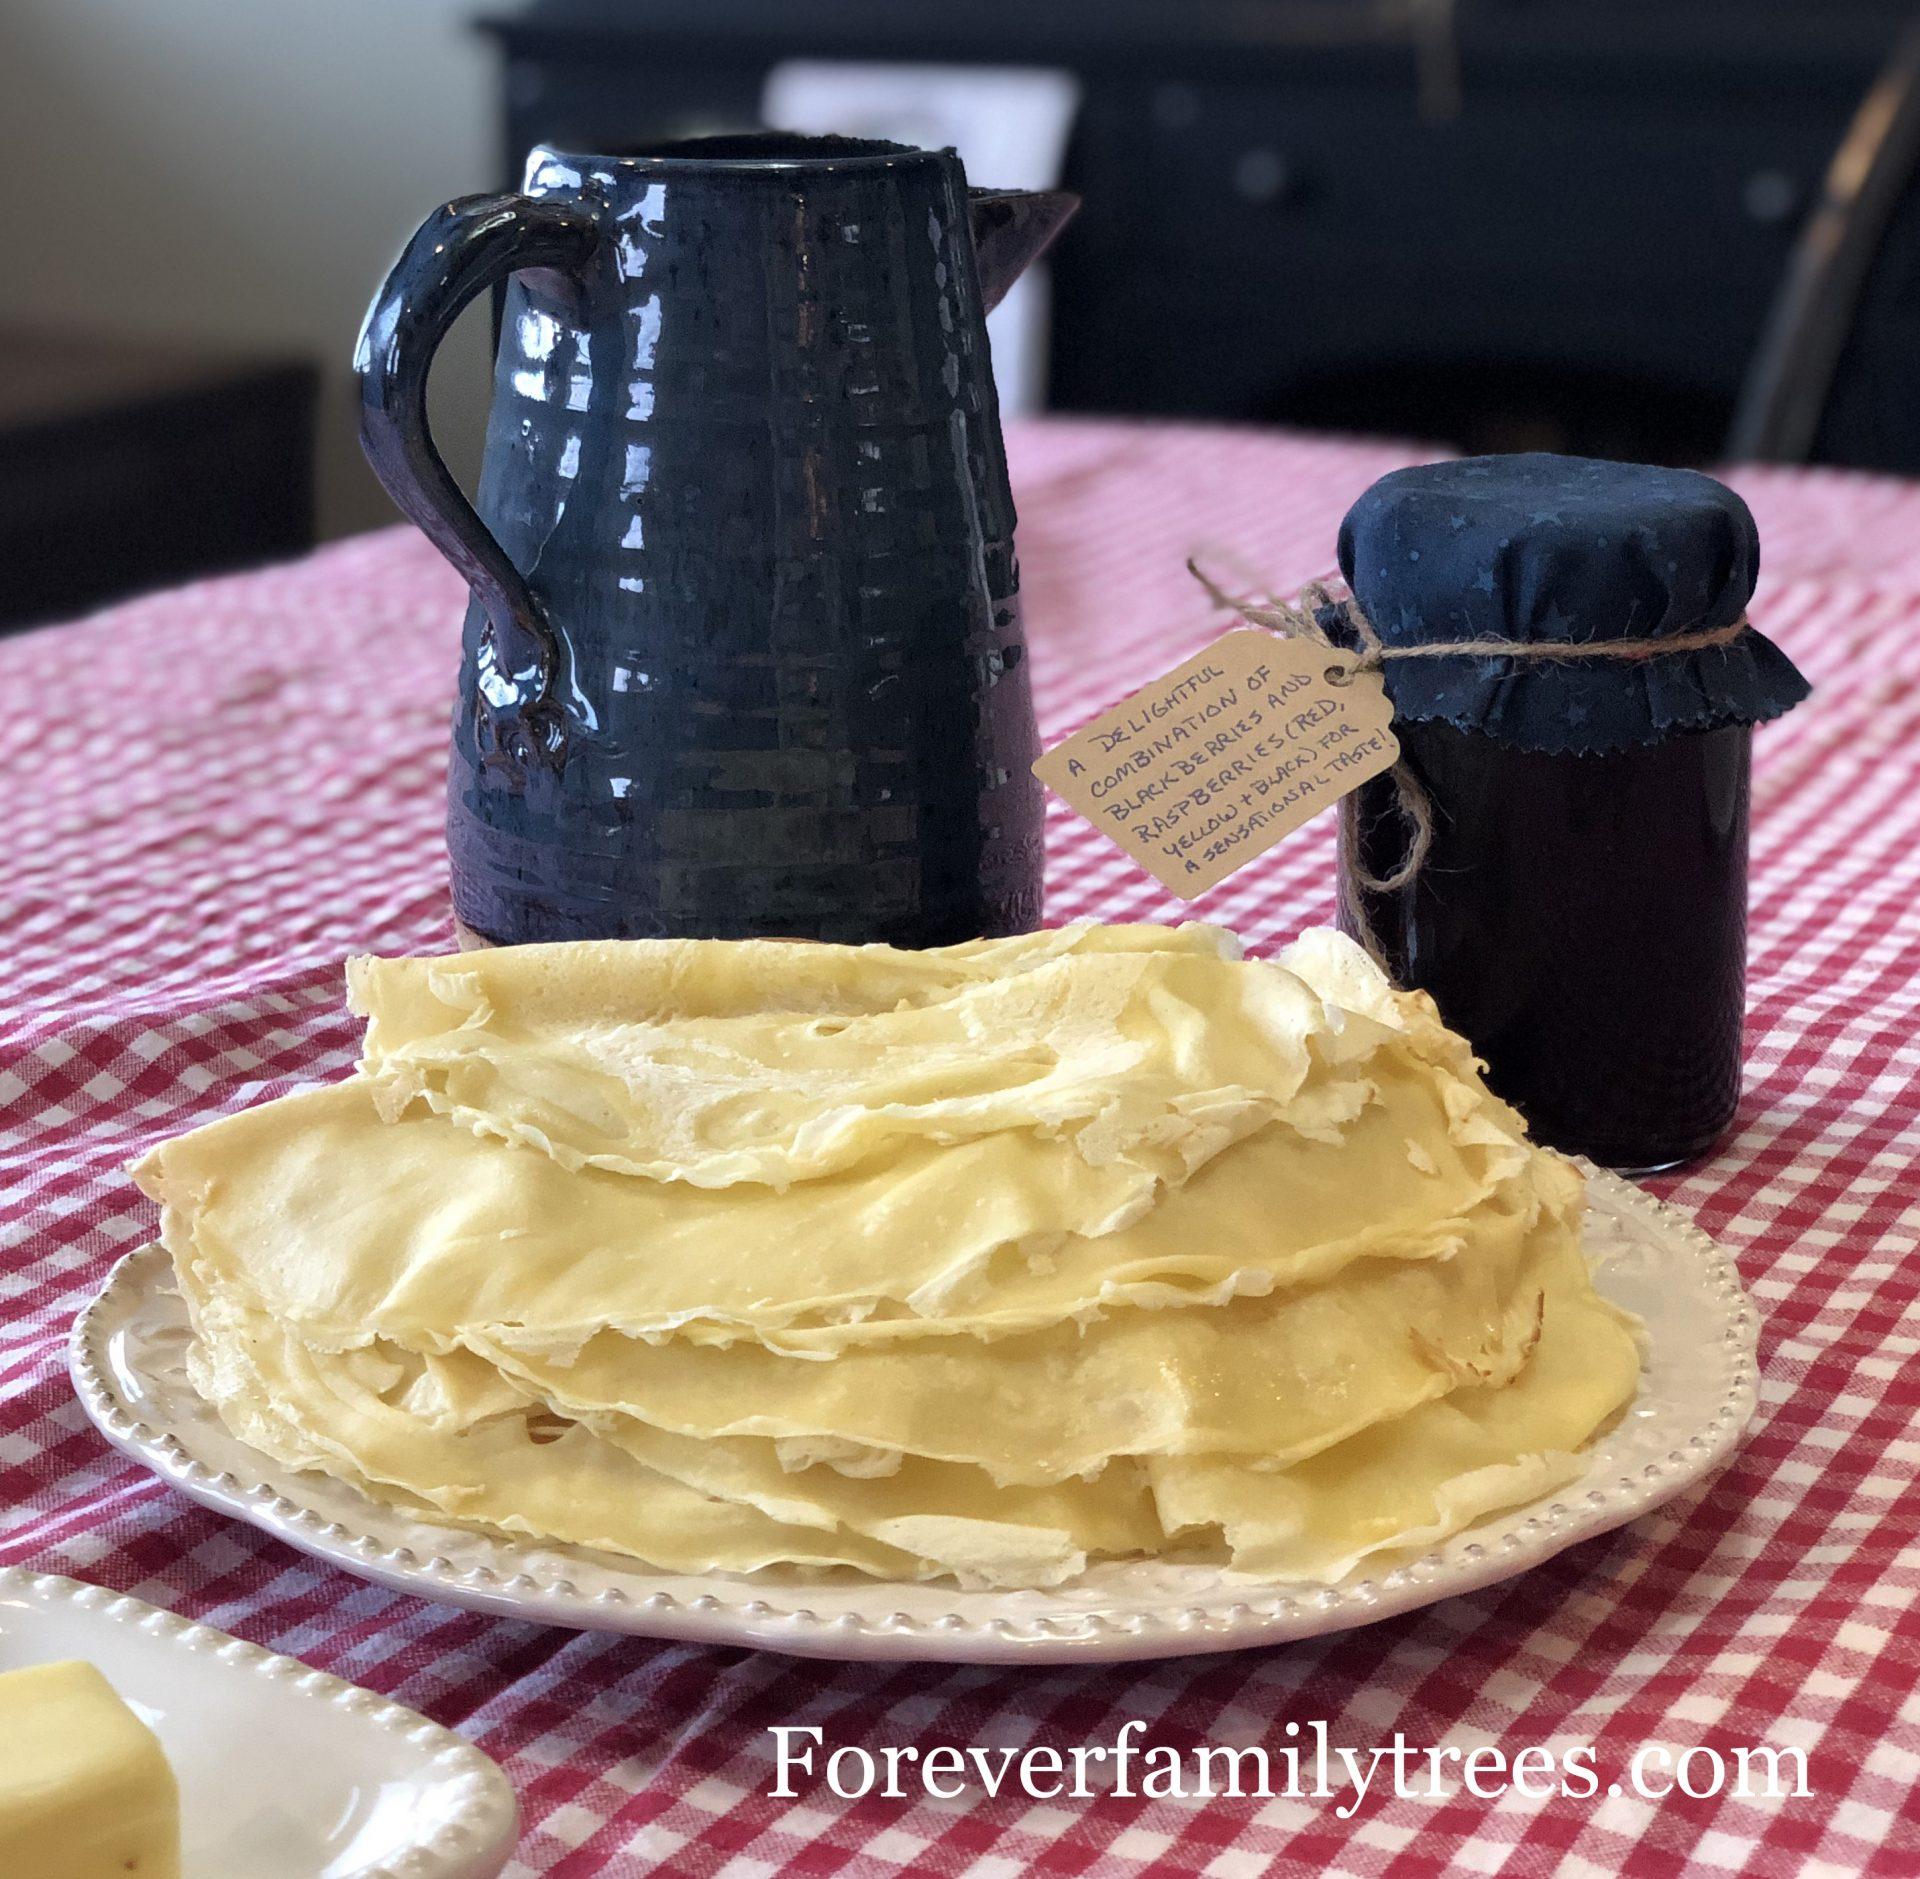 forever family trees recipes from the past: palacinka